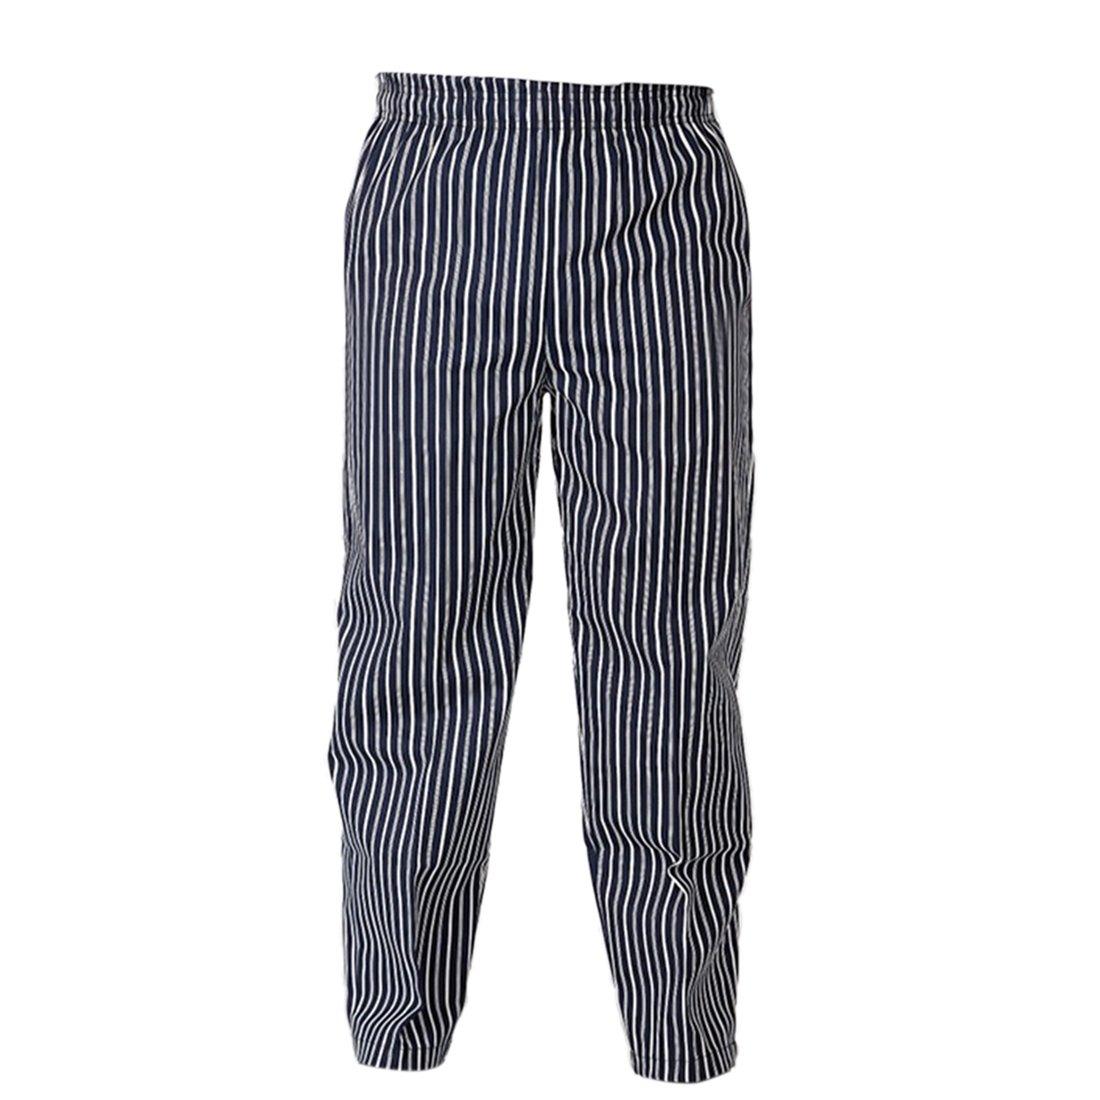 YUENA CARE Men Chefs Trousers Cotton Blend Baggy Cargo Pants Workwear (Blue White Stripe,Asian L)